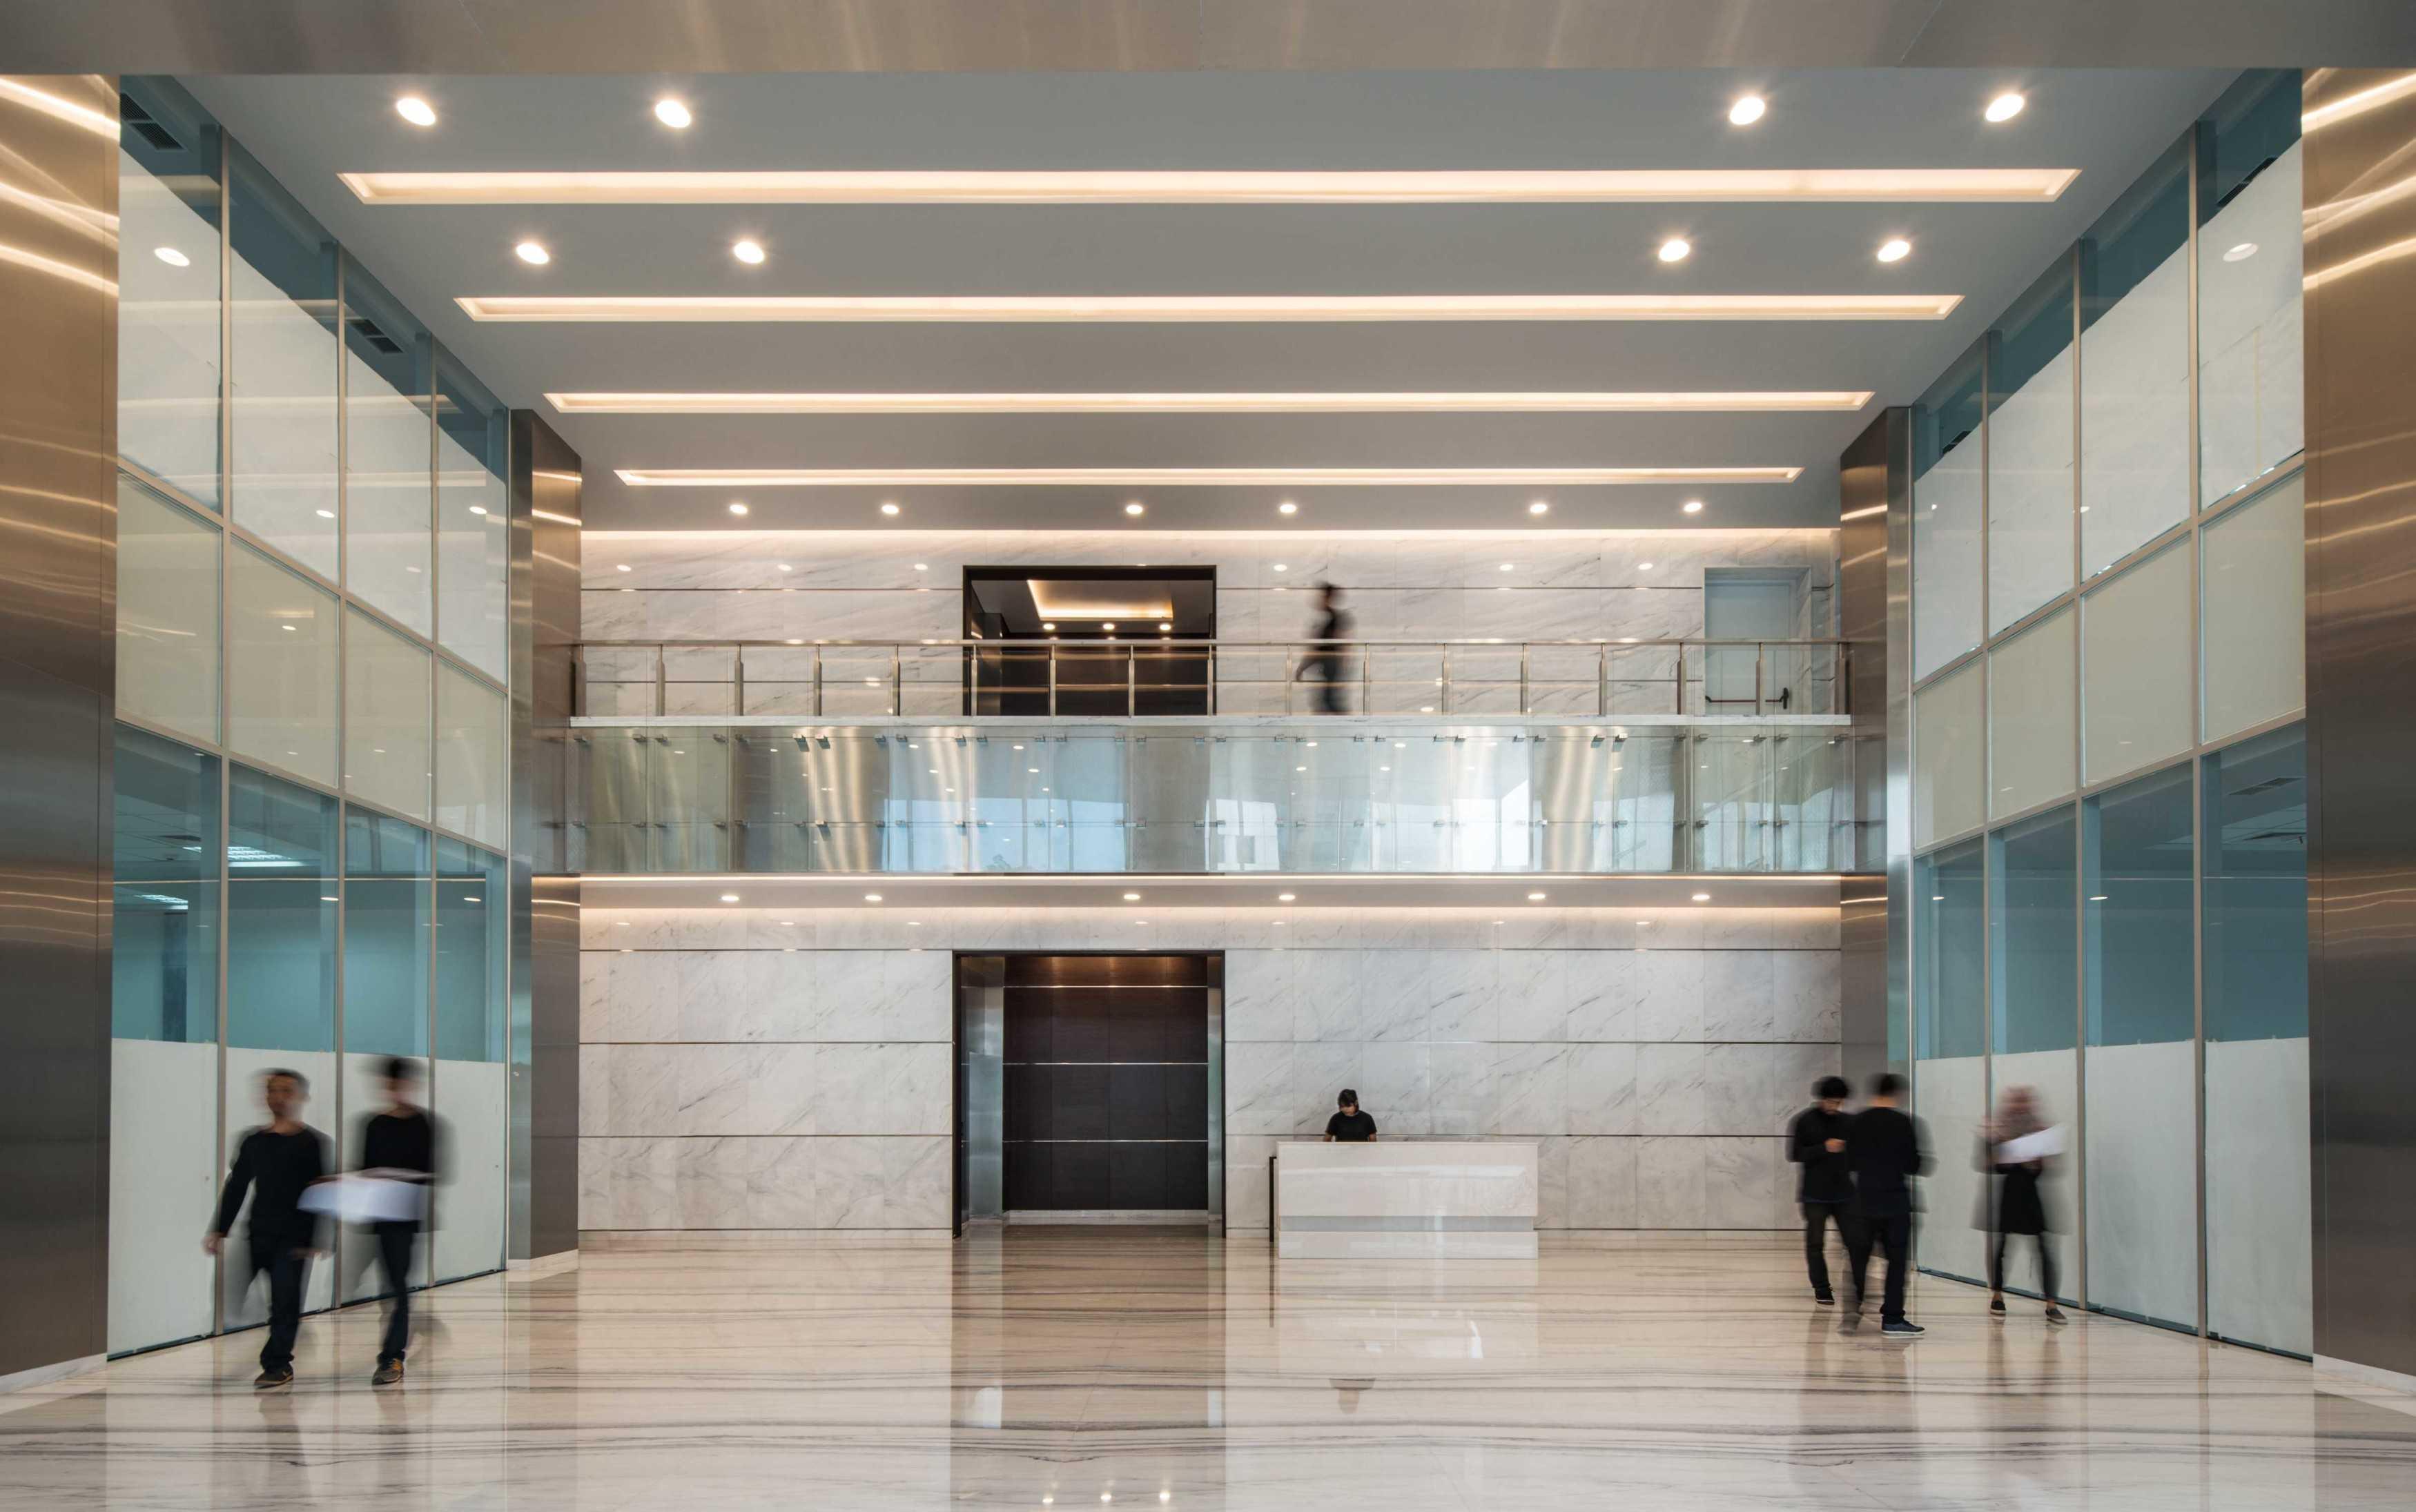 Studio Sa_E Jagat Tower Tomang, Grogol Petamburan, Kota Jakarta Barat, Daerah Khusus Ibukota Jakarta, Indonesia Tomang, Grogol Petamburan, Kota Jakarta Barat, Daerah Khusus Ibukota Jakarta, Indonesia Lobby Area Modern  50372